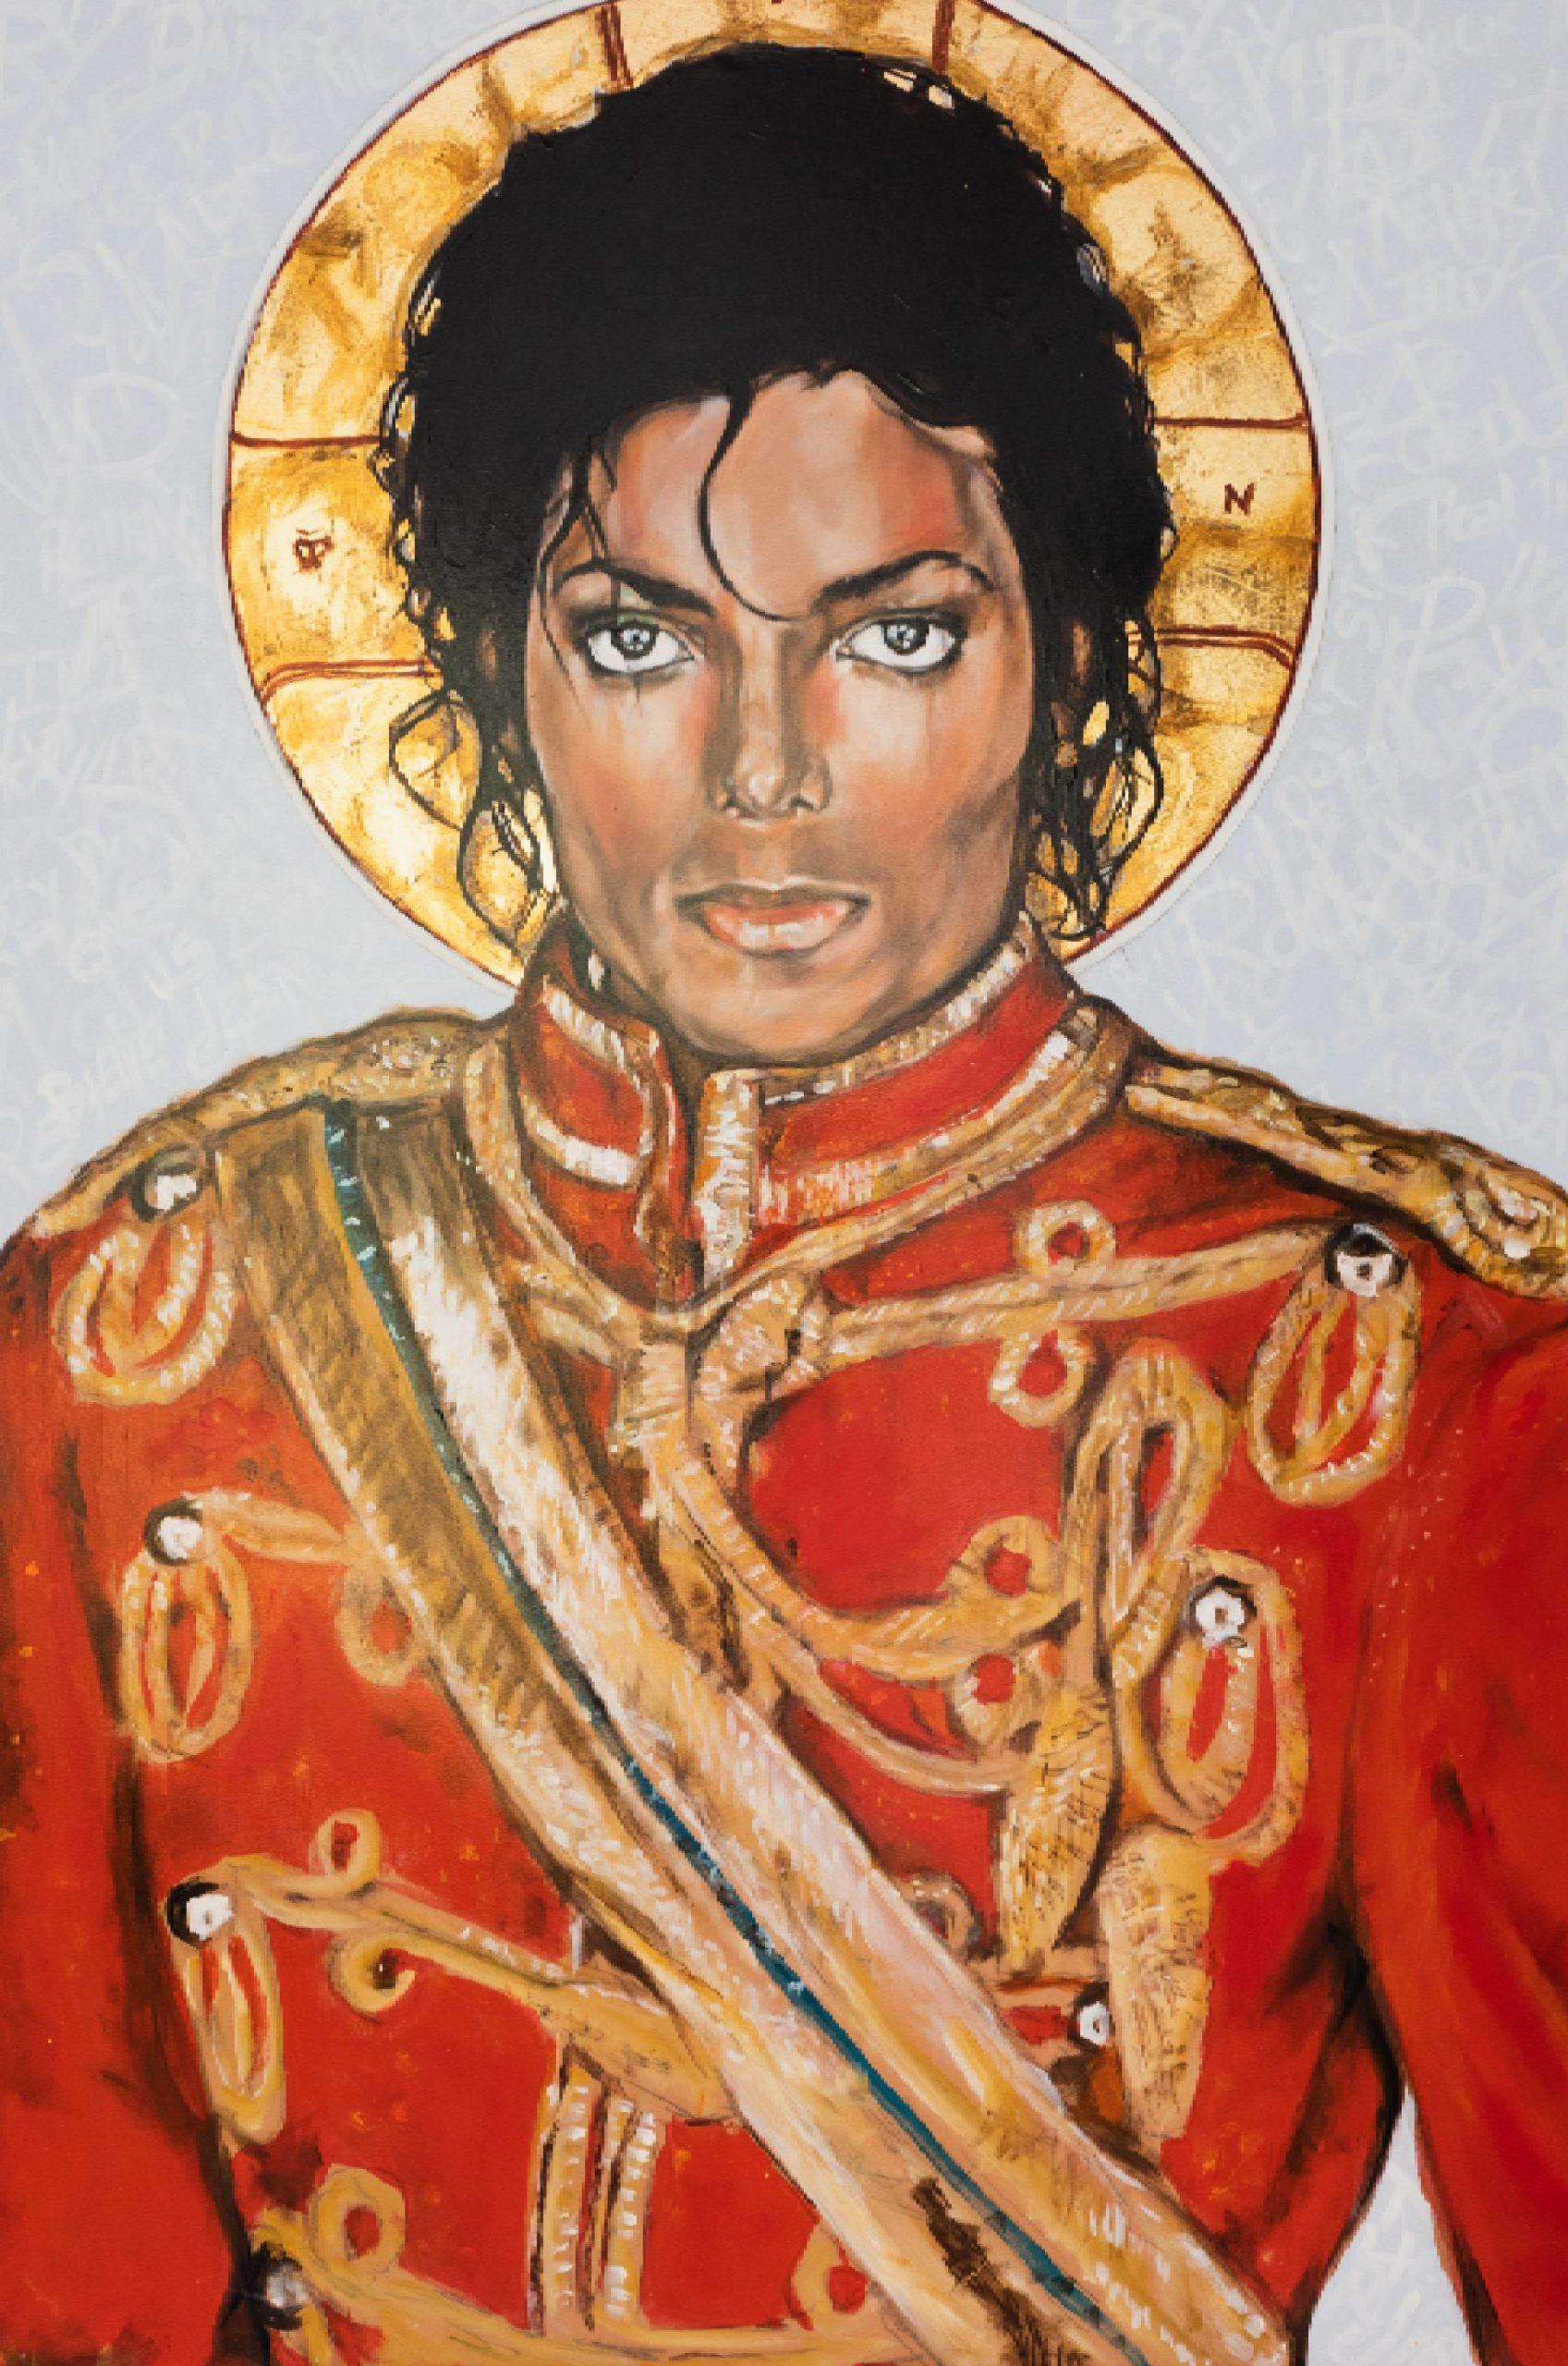 GOD - MICHAEL JACKSON